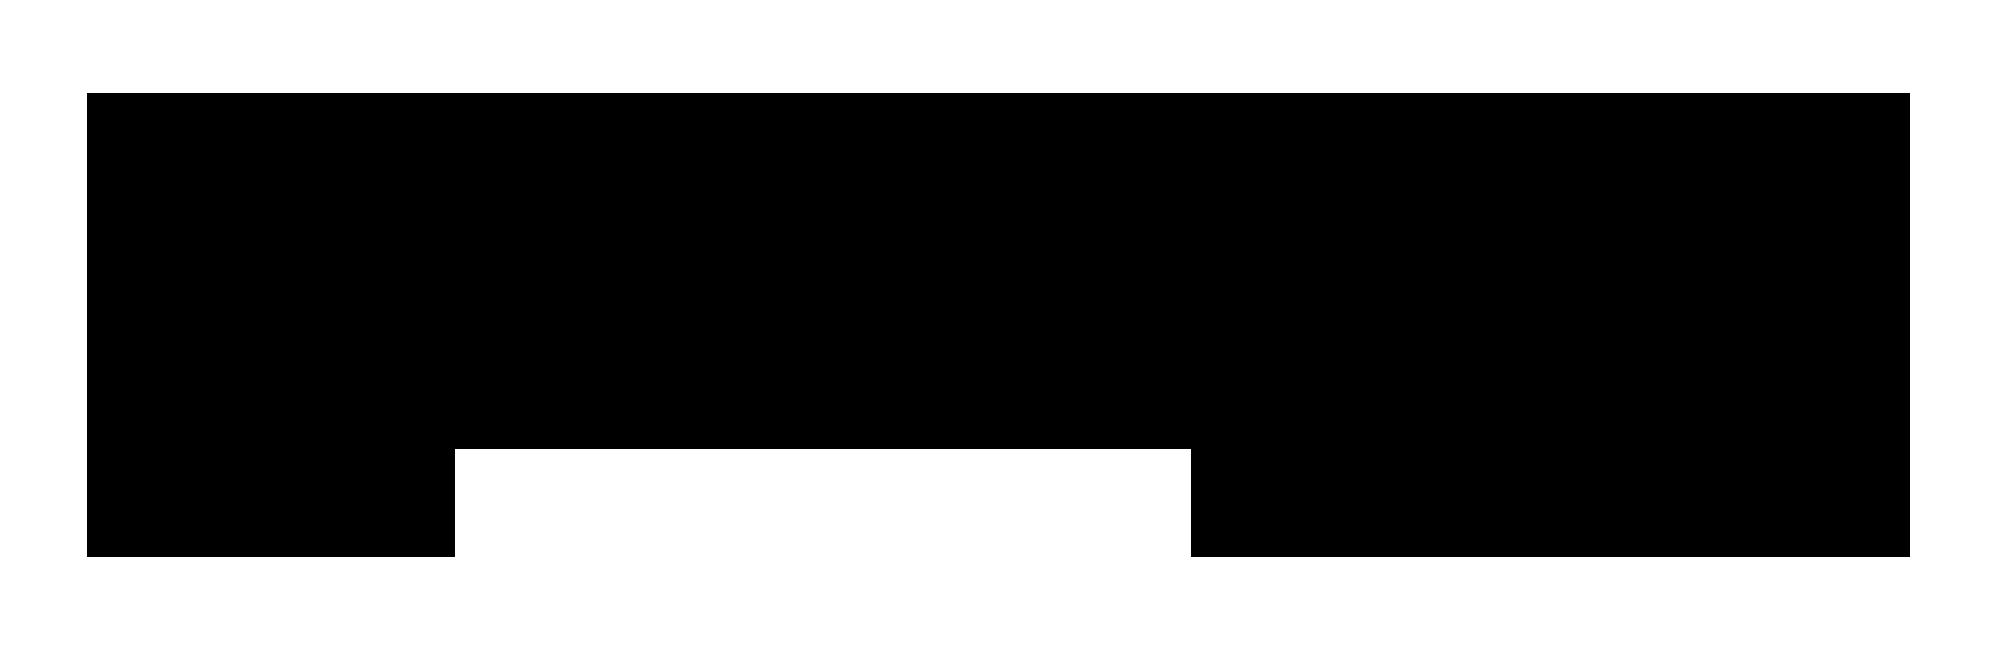 TUCKER IMAGES